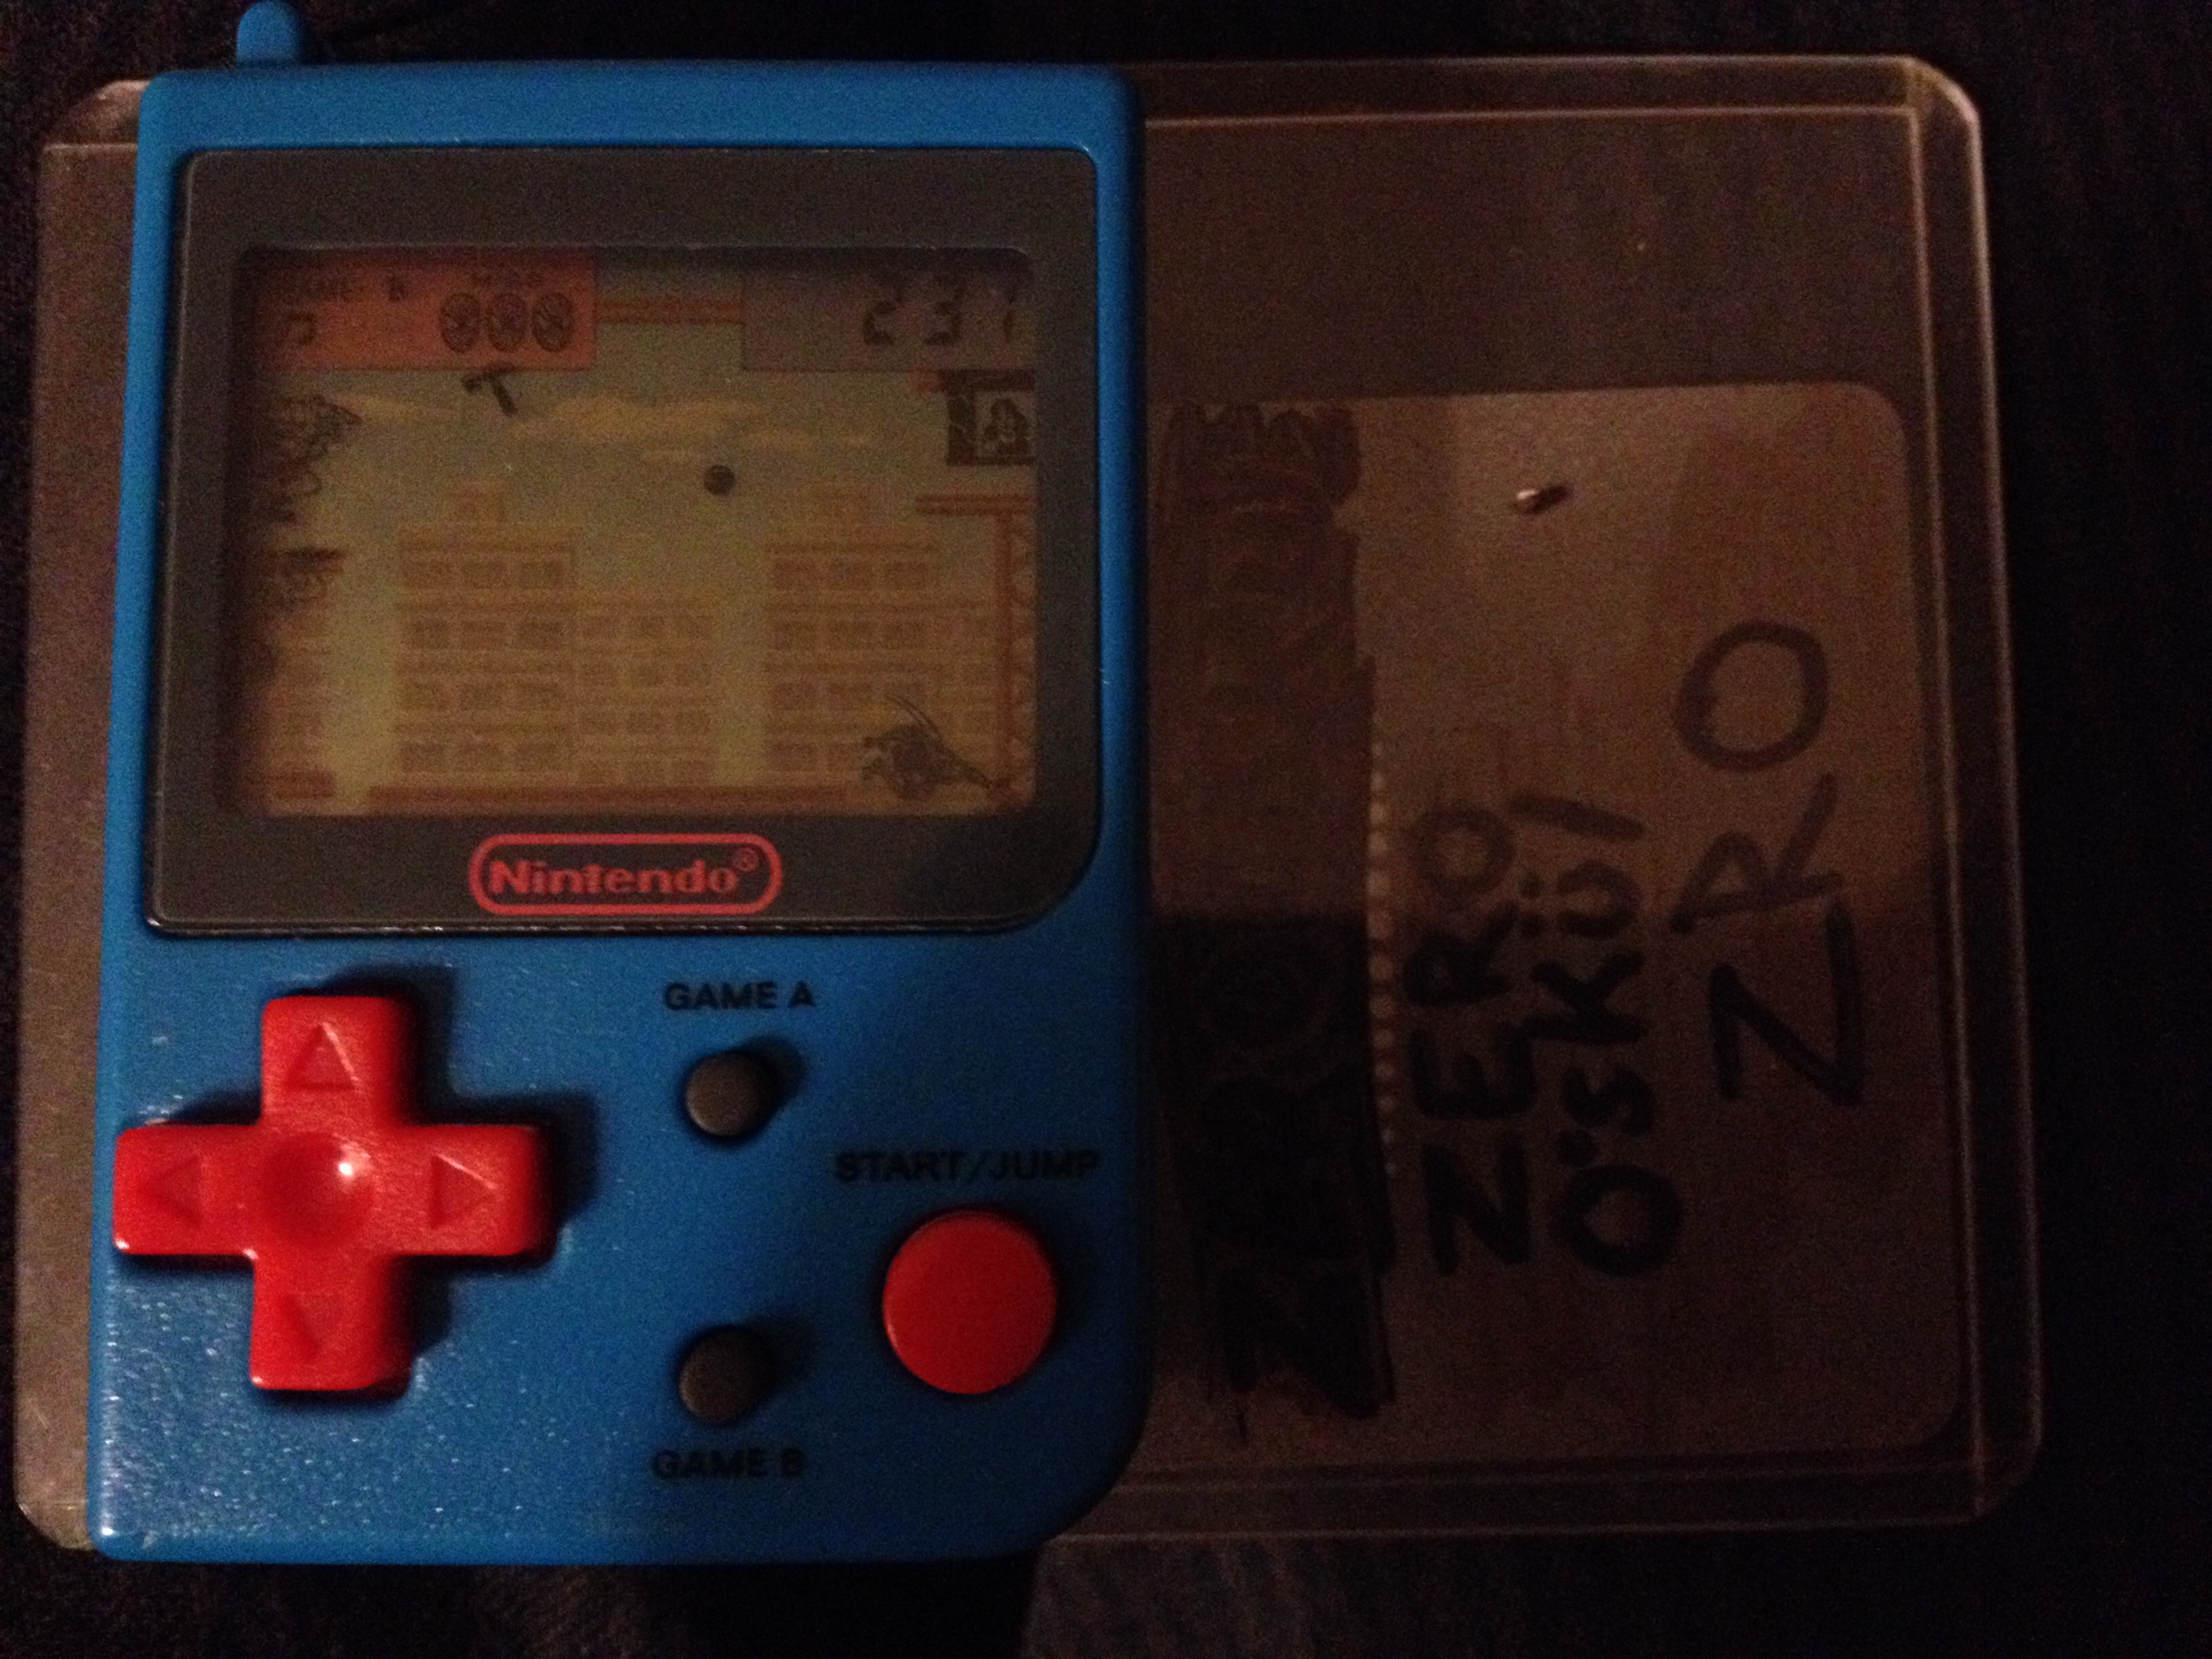 zerooskul: Nintendo Mini Classics: Spider-Man [Game B] (Dedicated Handheld) 231 points on 2019-07-26 01:08:09